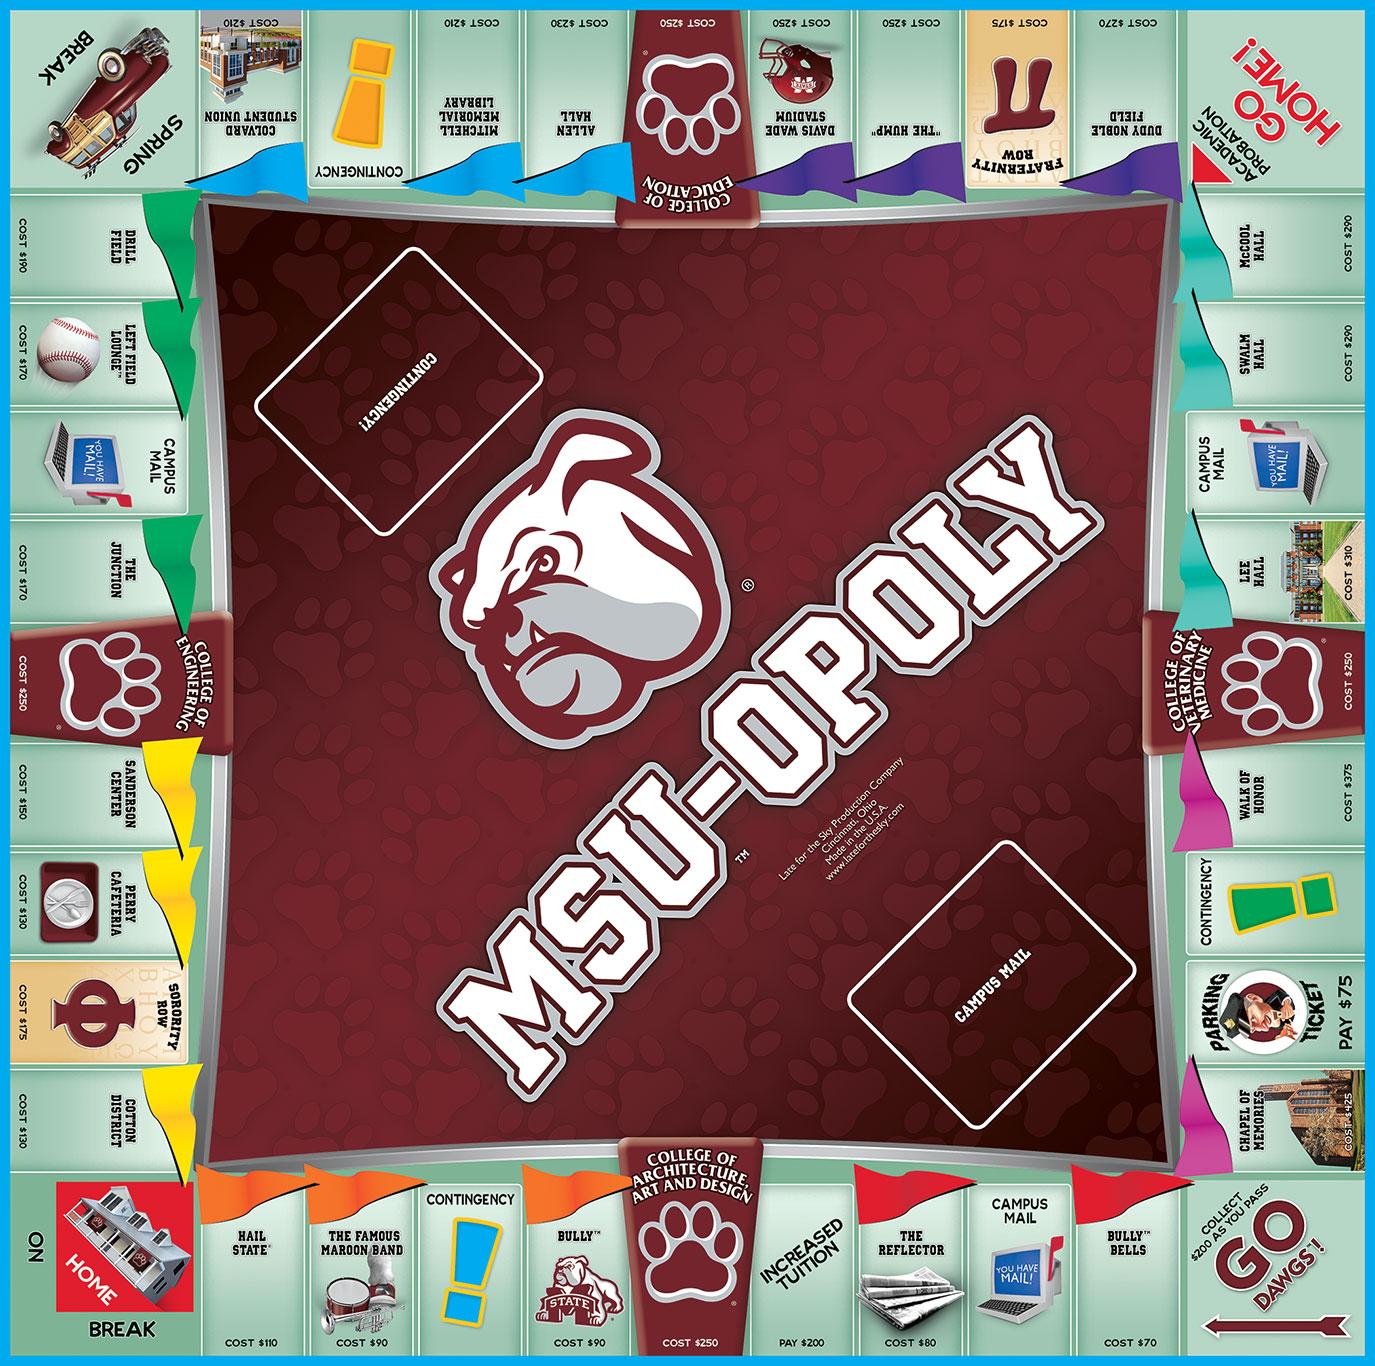 MSU-OPOLY Board Game